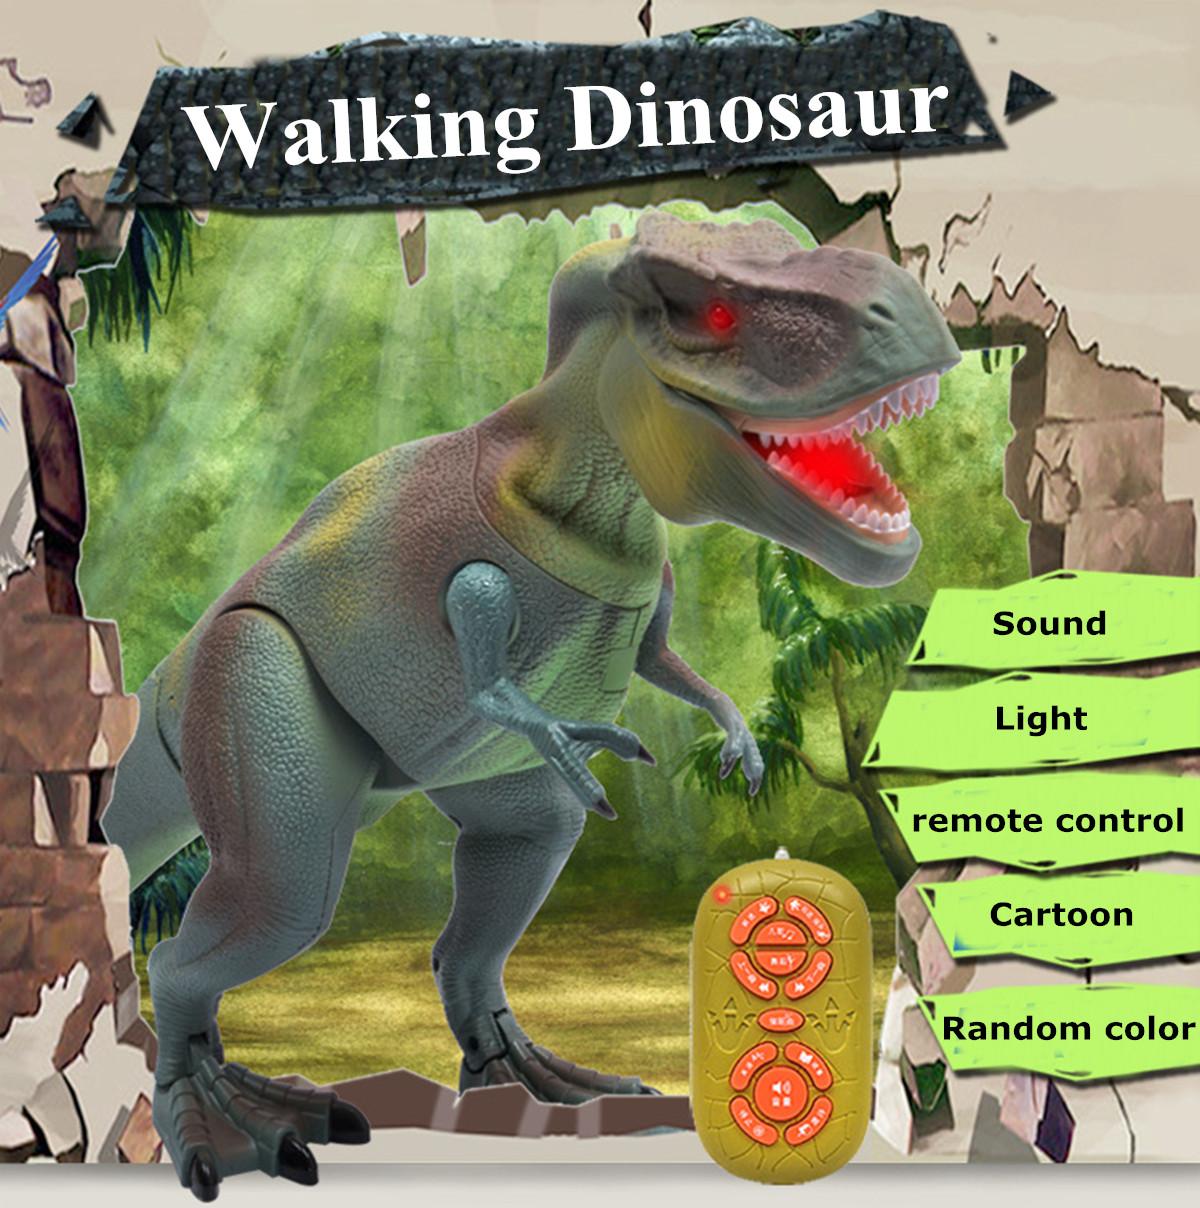 RC Remote Control Walking Dinosaur Lights Sounds Kids Children Action Toys Gift